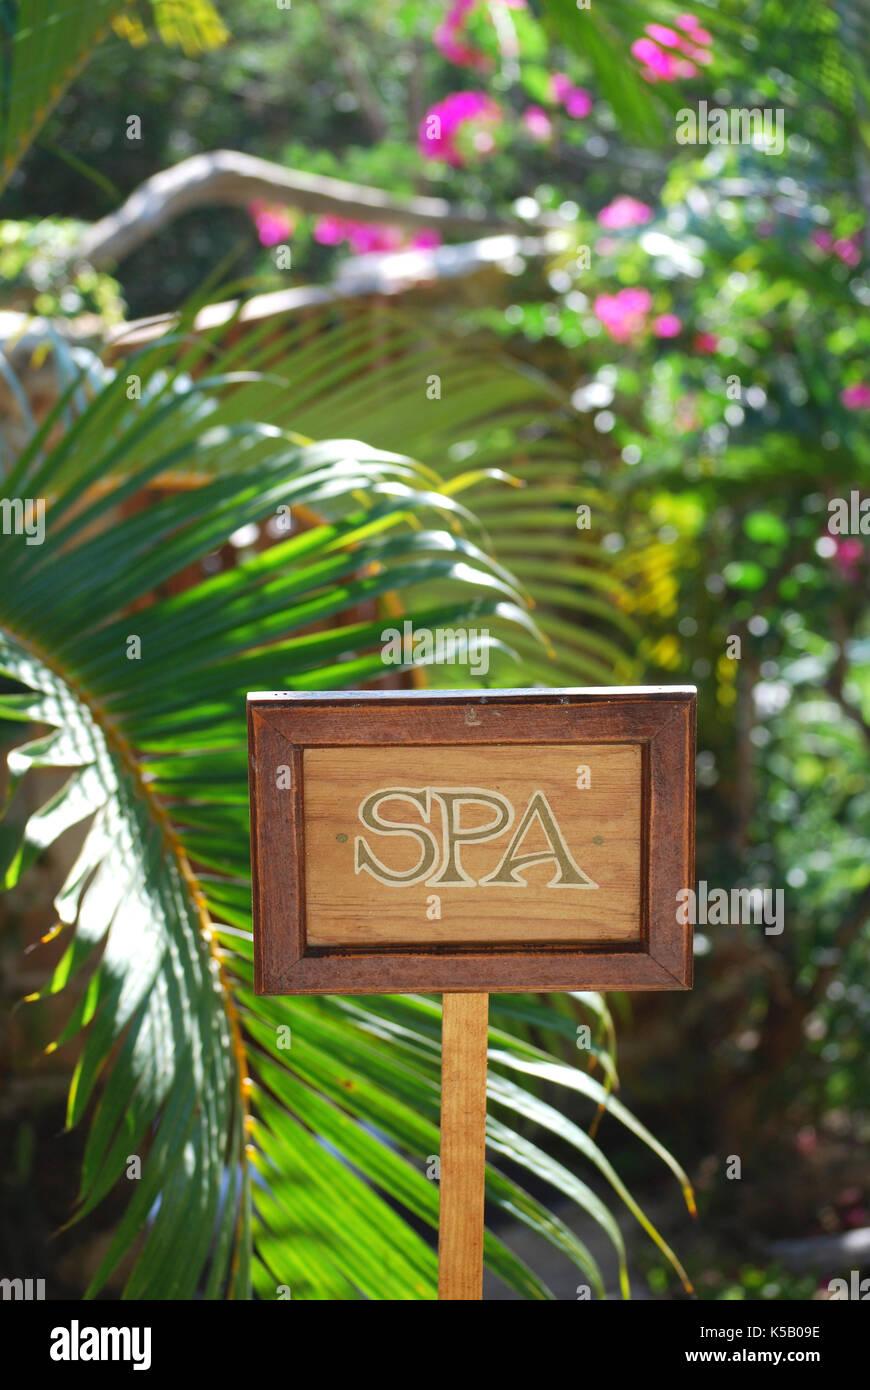 Spa sign, Yelapa, Mexico - Stock Image